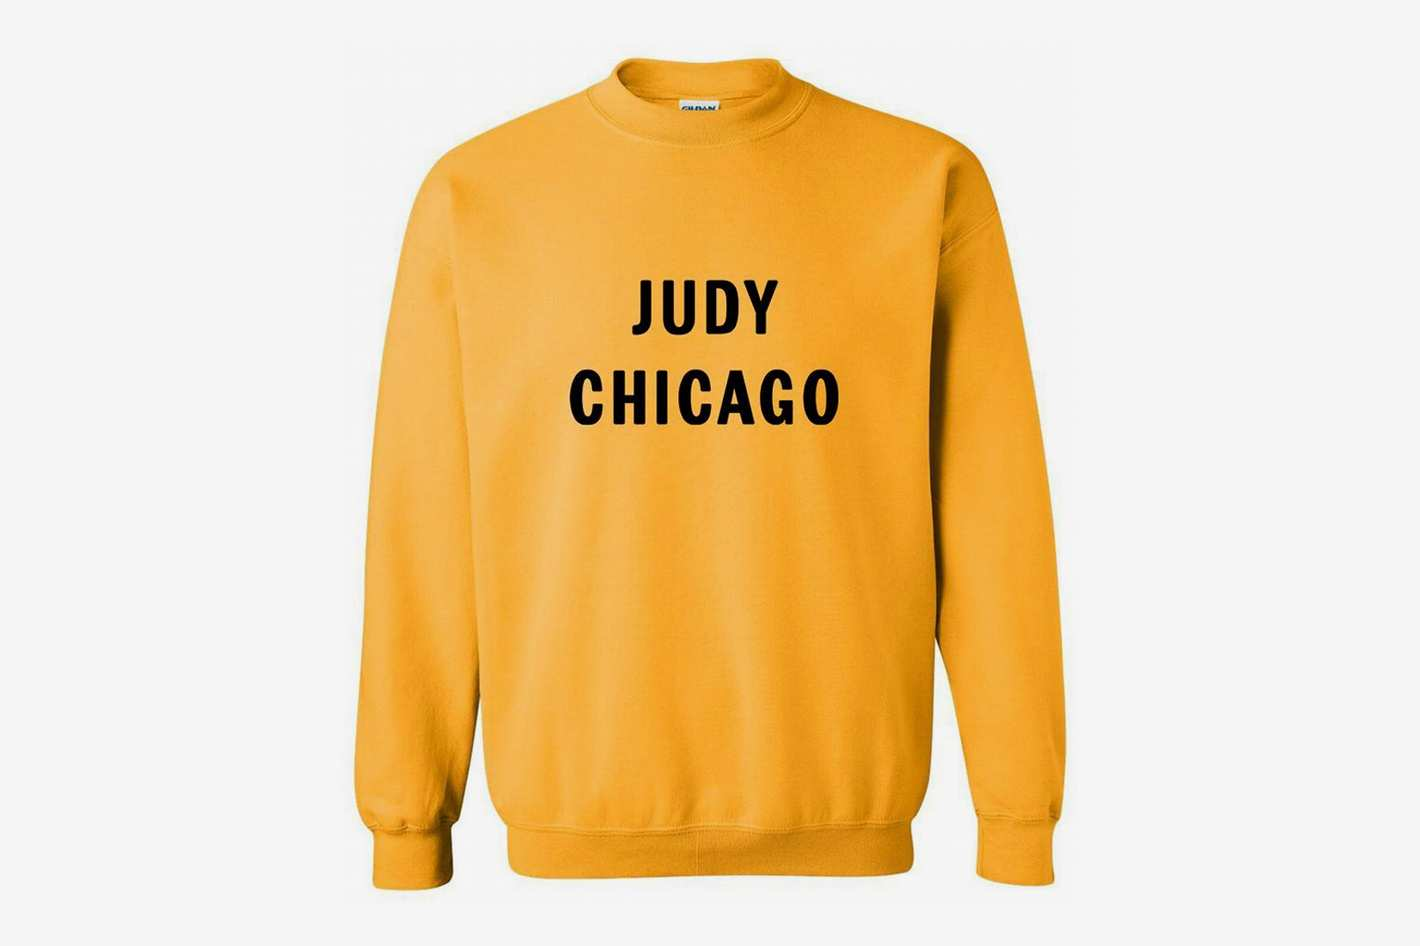 Artware Editions Sweatshirt by Judy Chicago